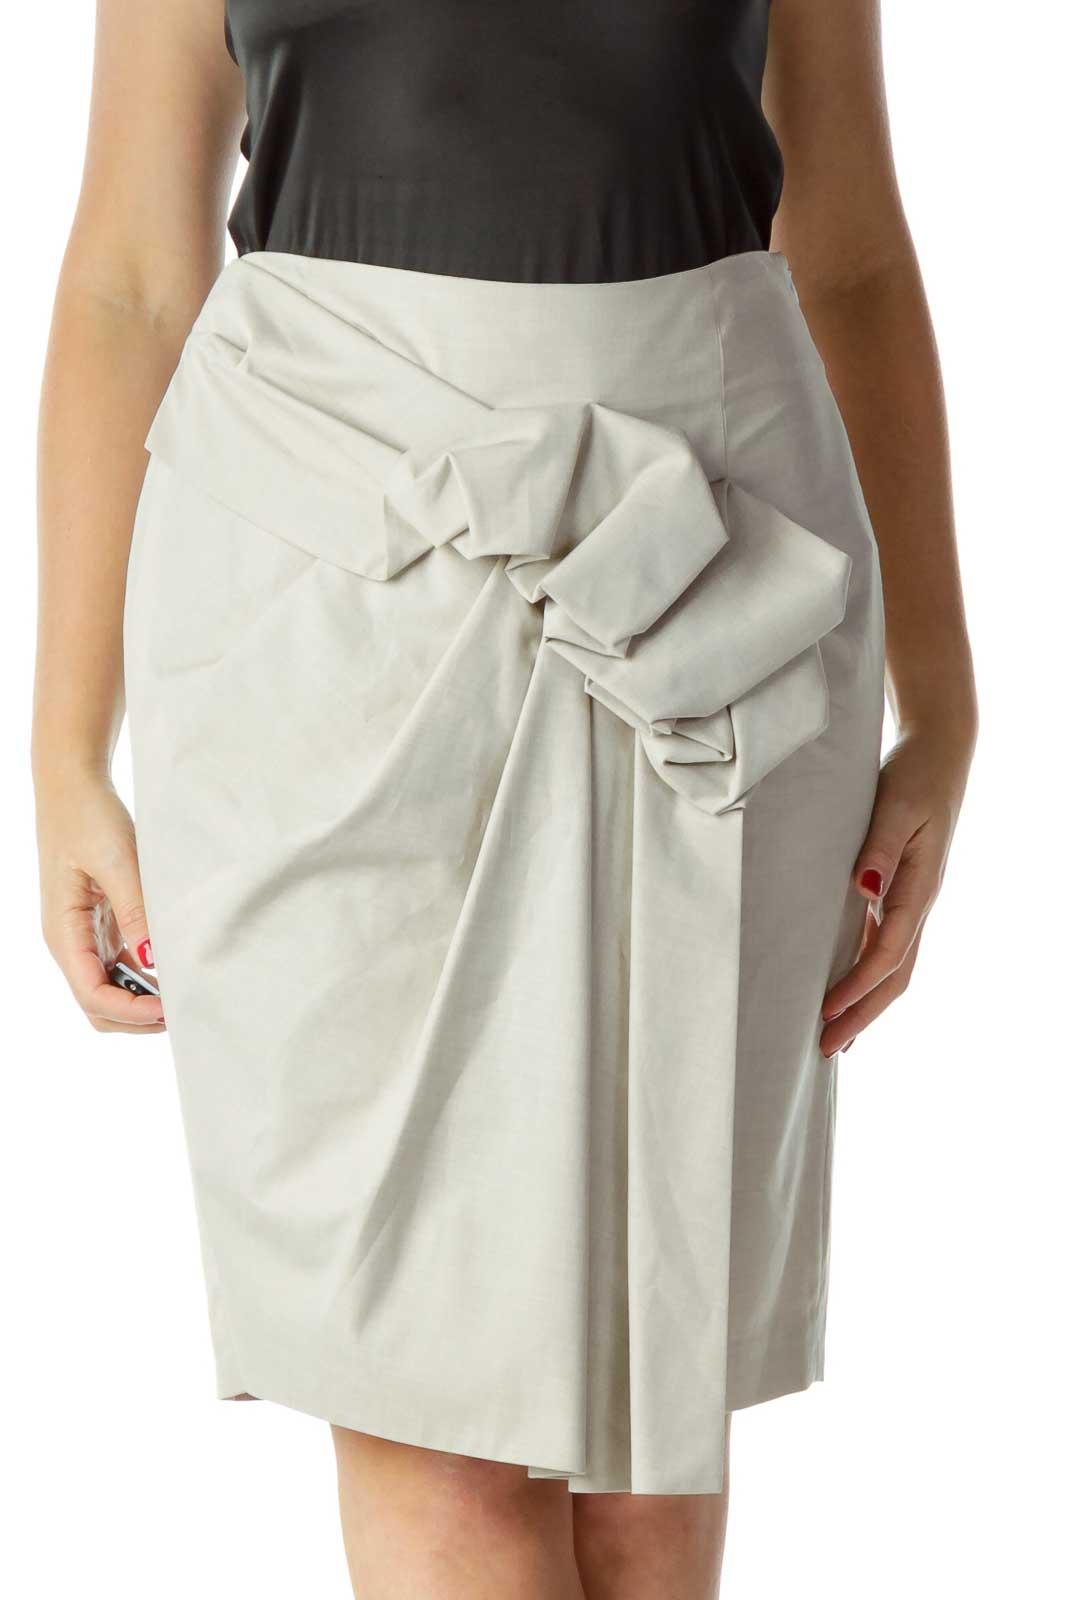 Gray Ruffled Pencil Skirt Front